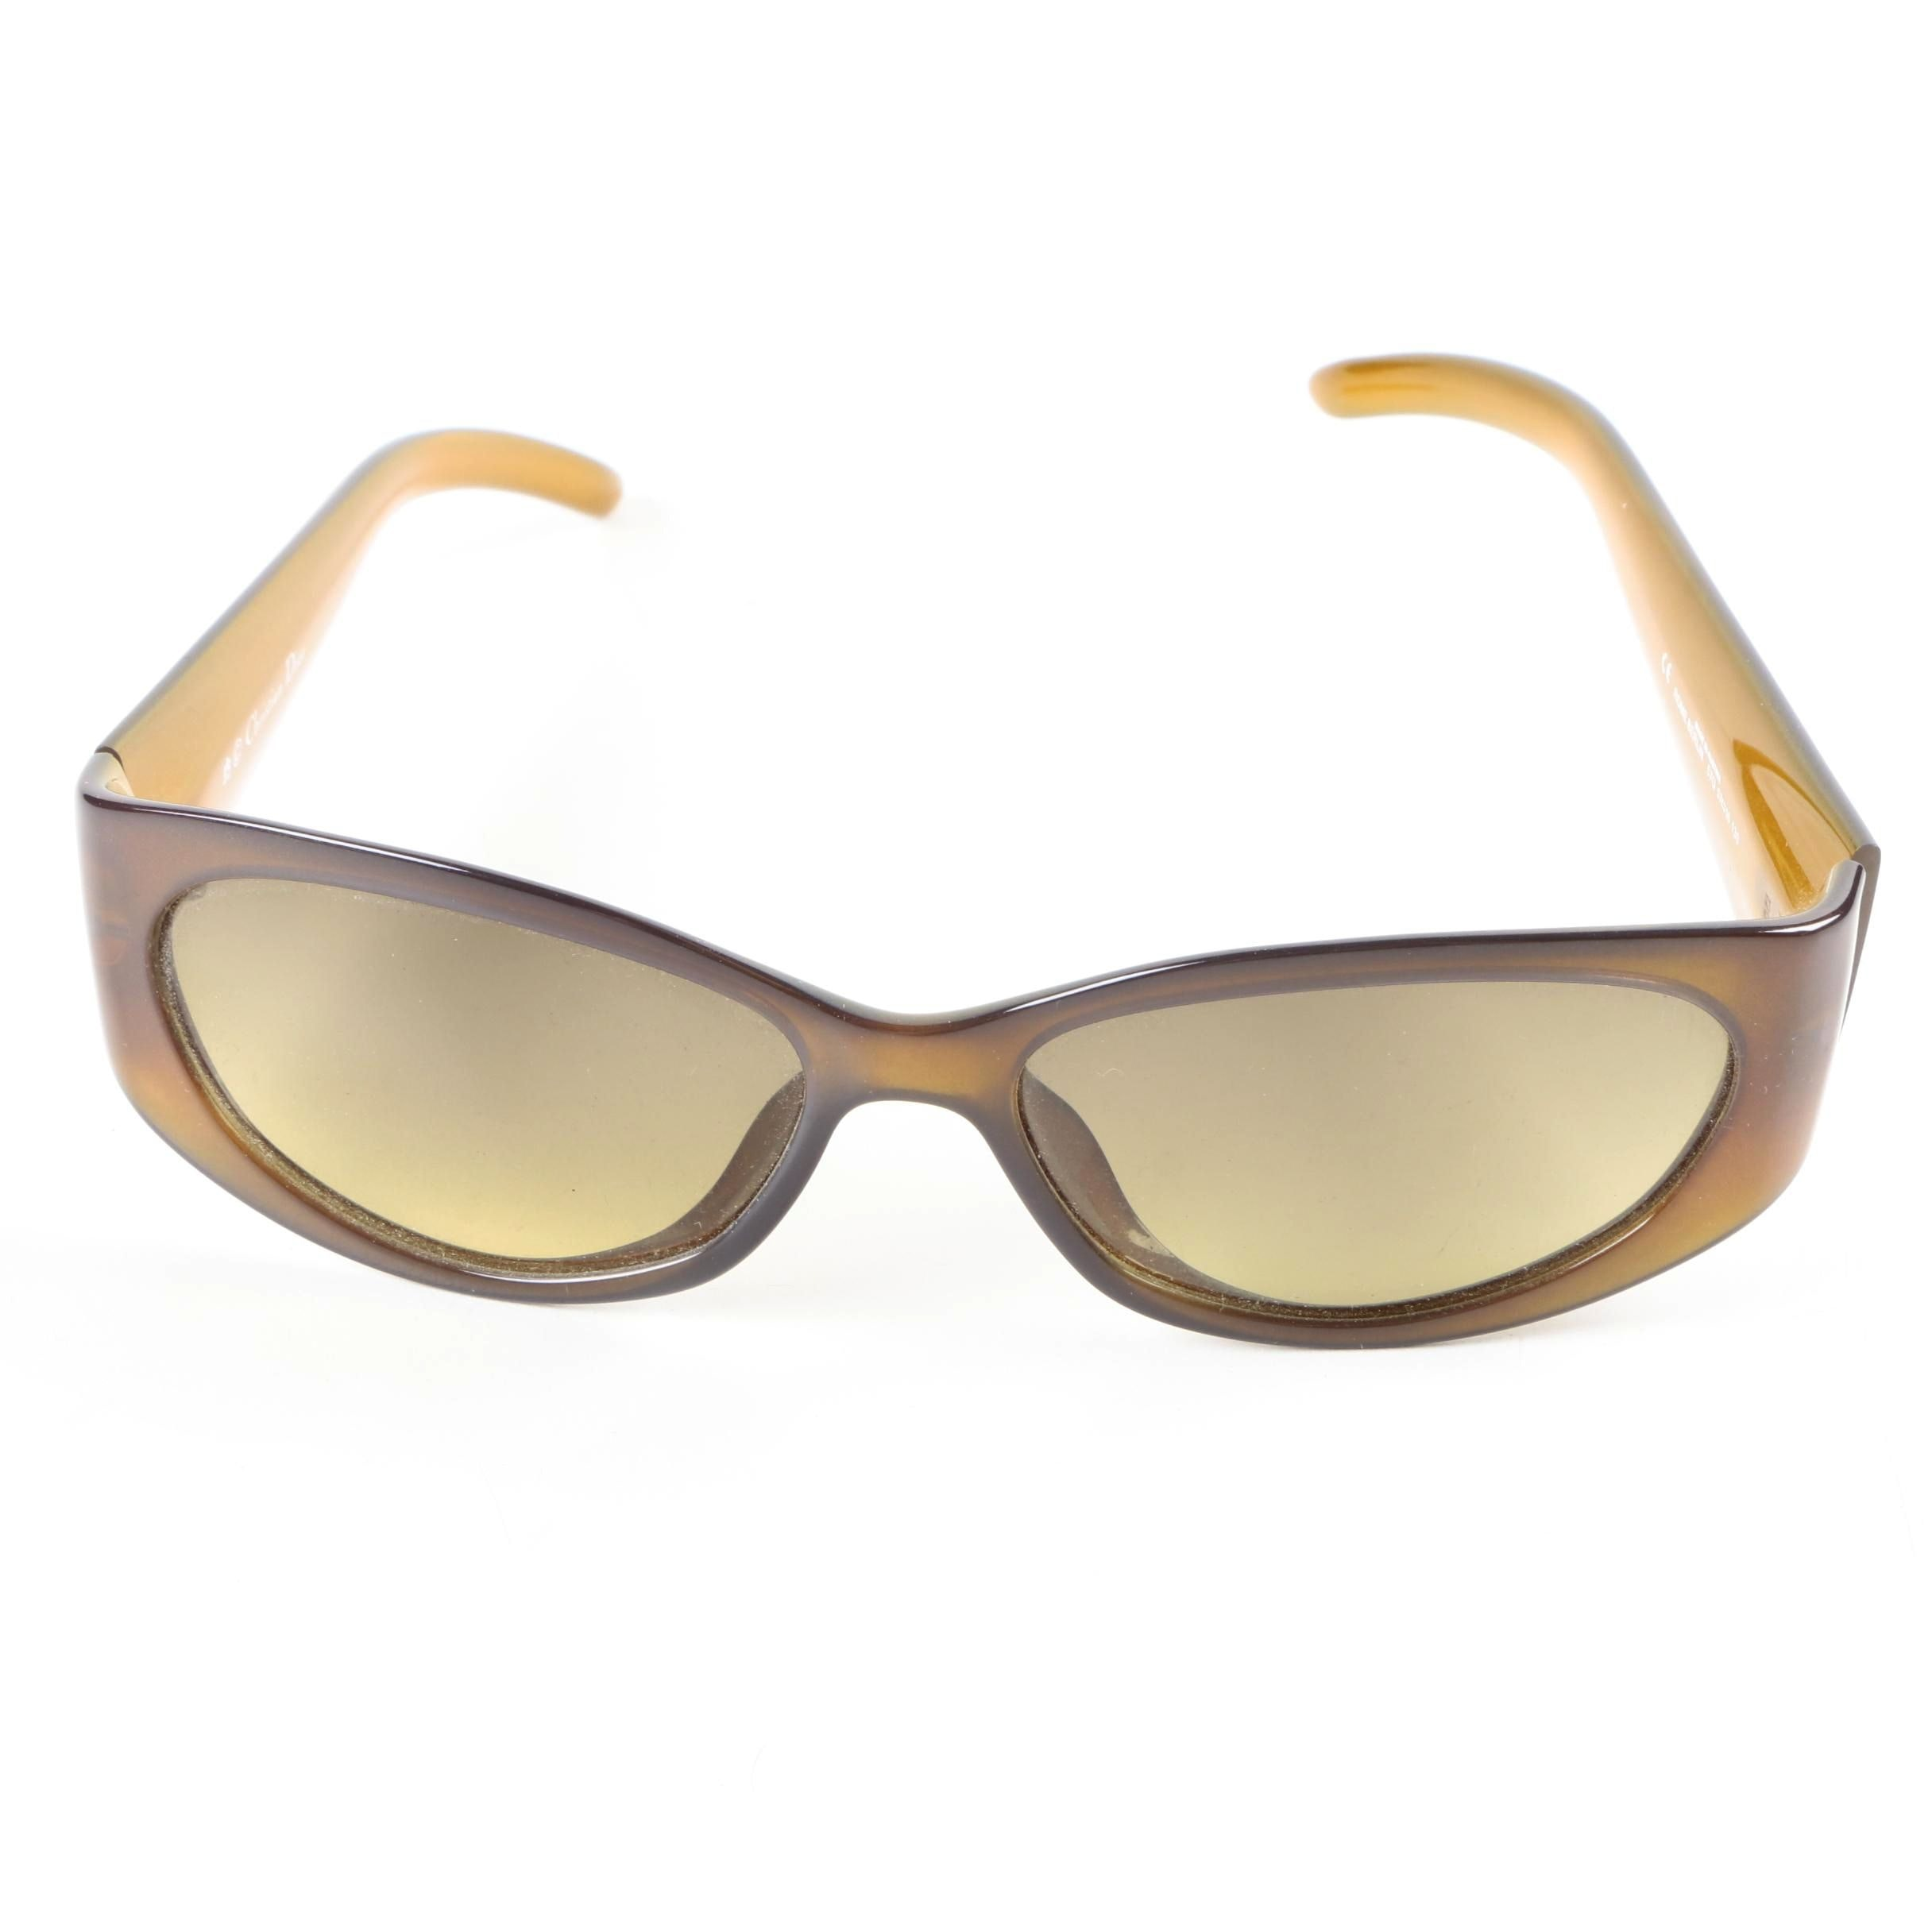 Women's Christian Dior Sunglasses